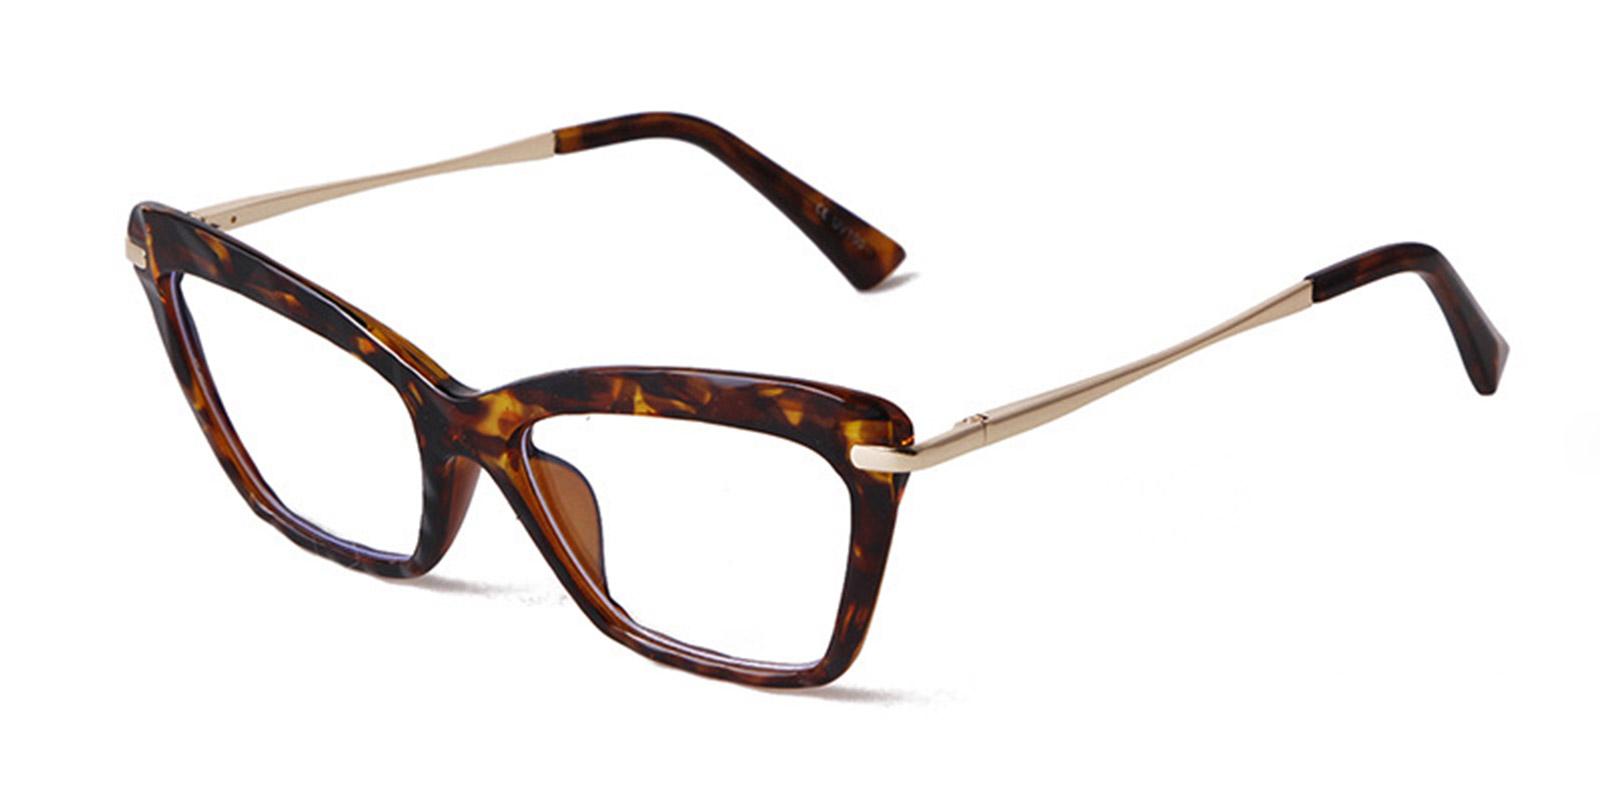 Iluminada-2021 new fashion retro cat eye glasses frame